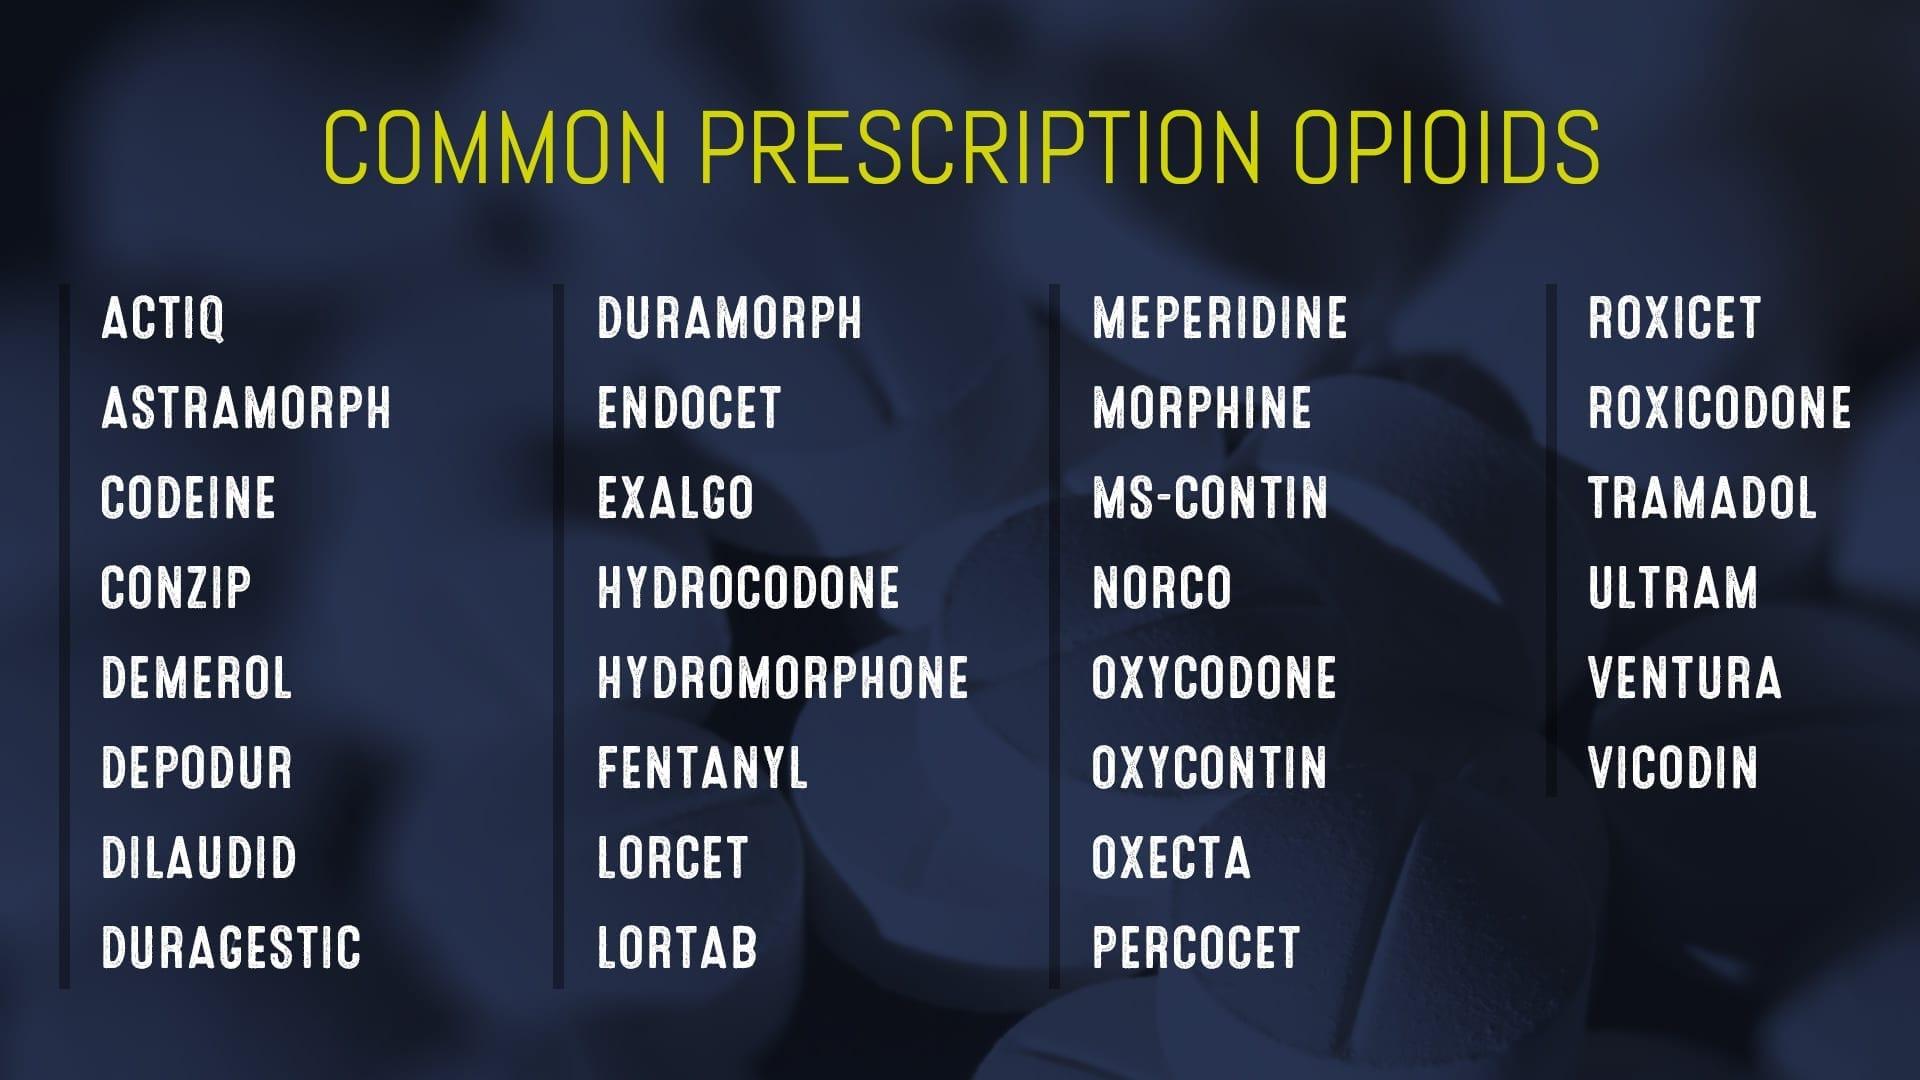 Opioids and Prescription Drug Abuse: Just Plain Killers